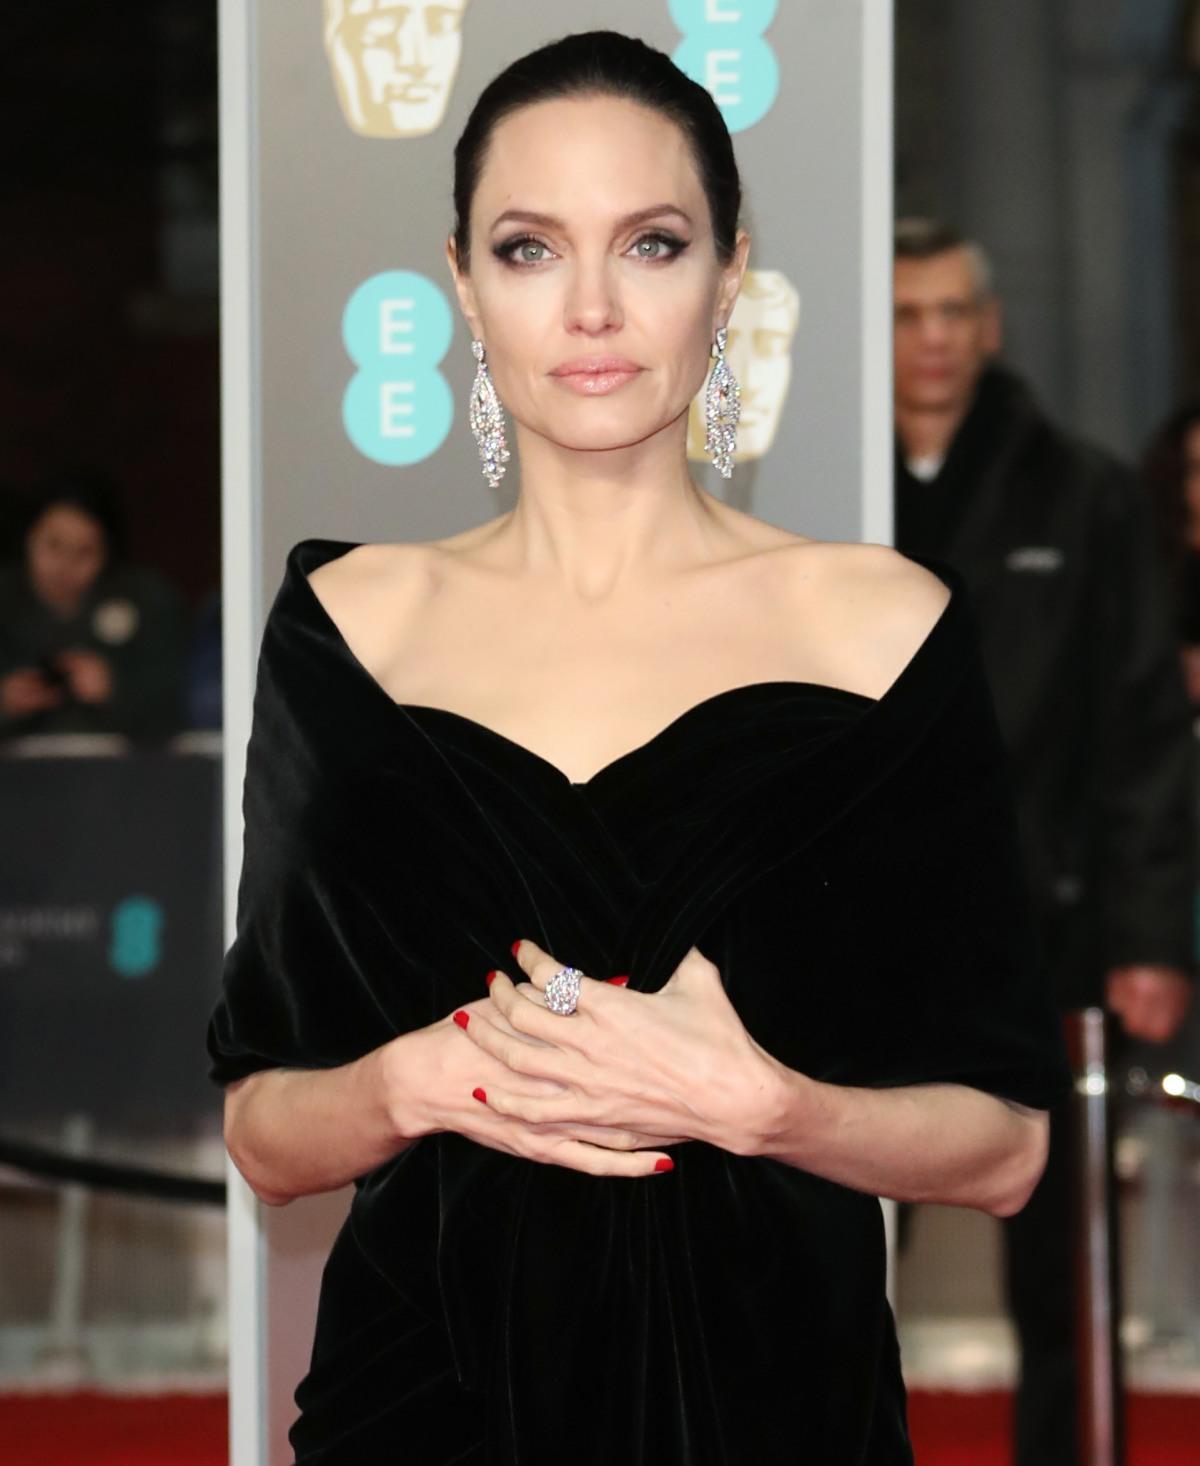 The British Academy Film Awards (BAFTA) 2018